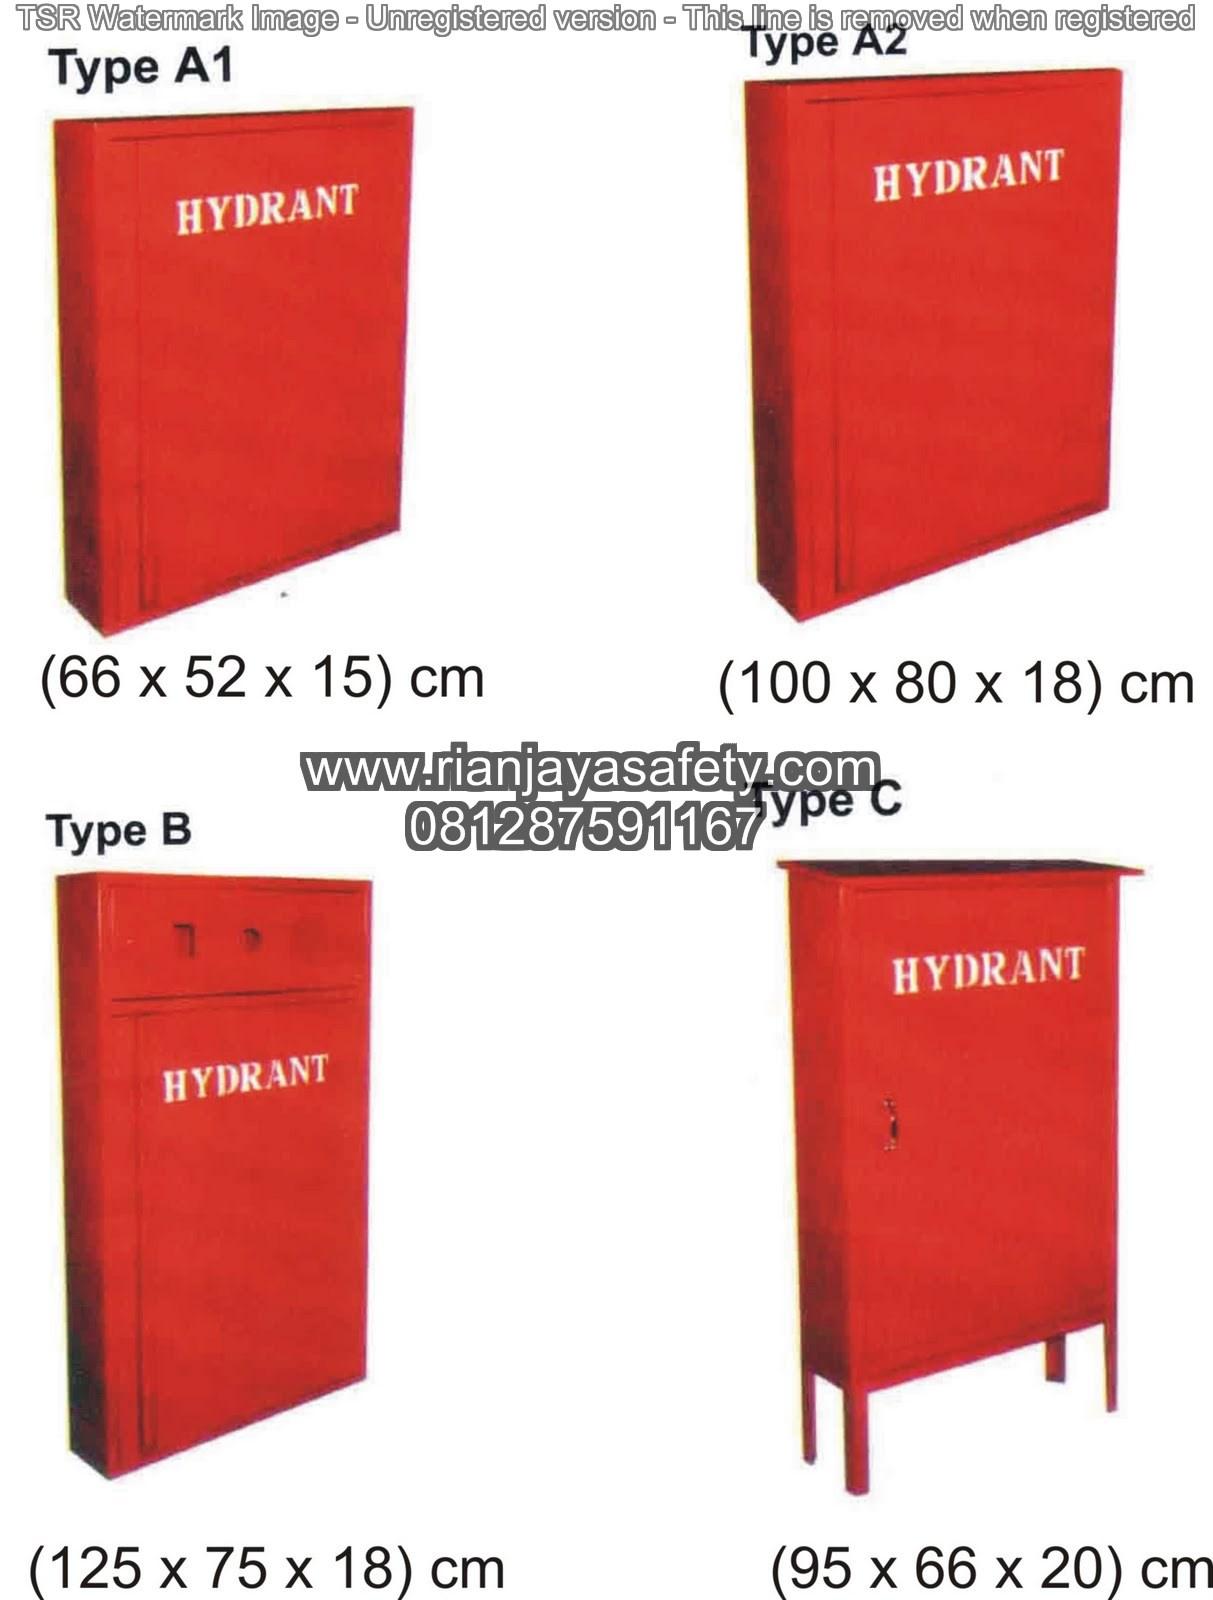 BOX HYDRANT TYPE A